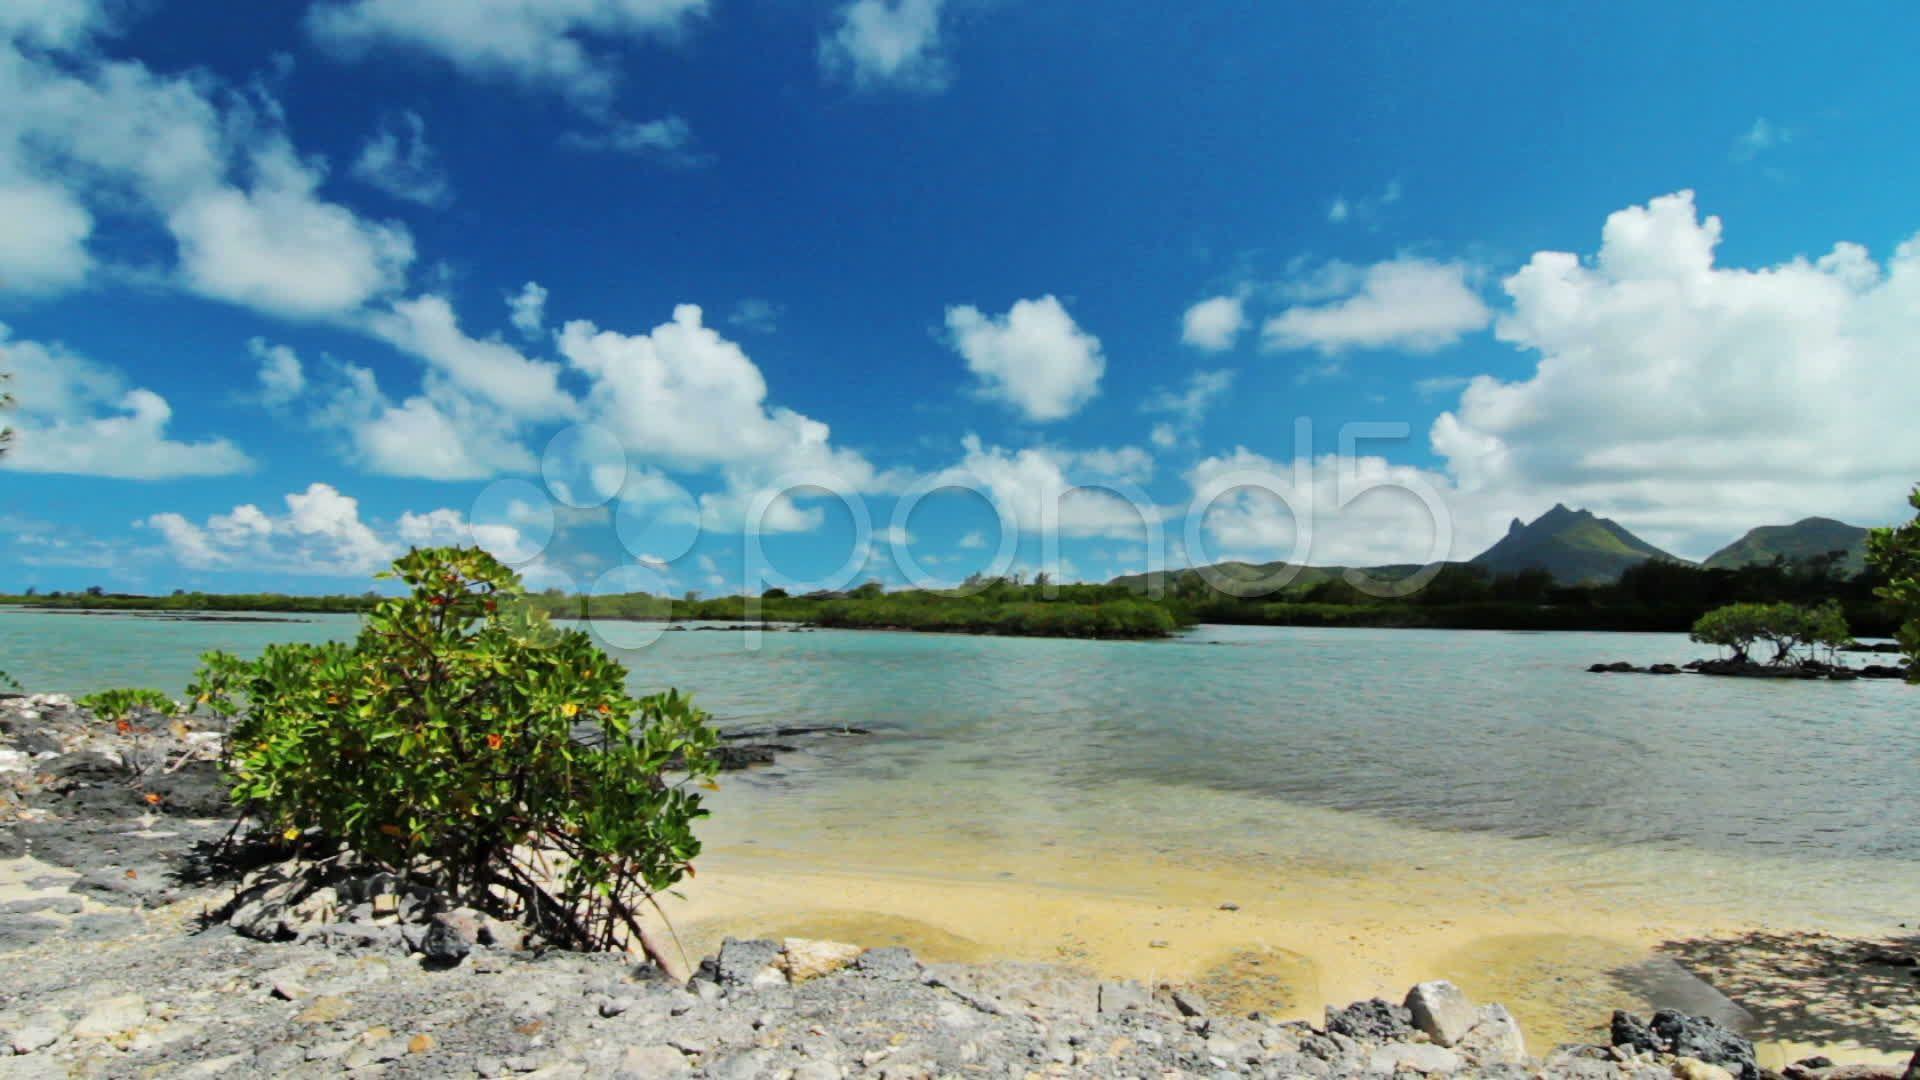 Ocean Landscape Stock Footage Ad Landscape Ocean Footage Stock In 2020 Ocean Landscape Landscape Ocean